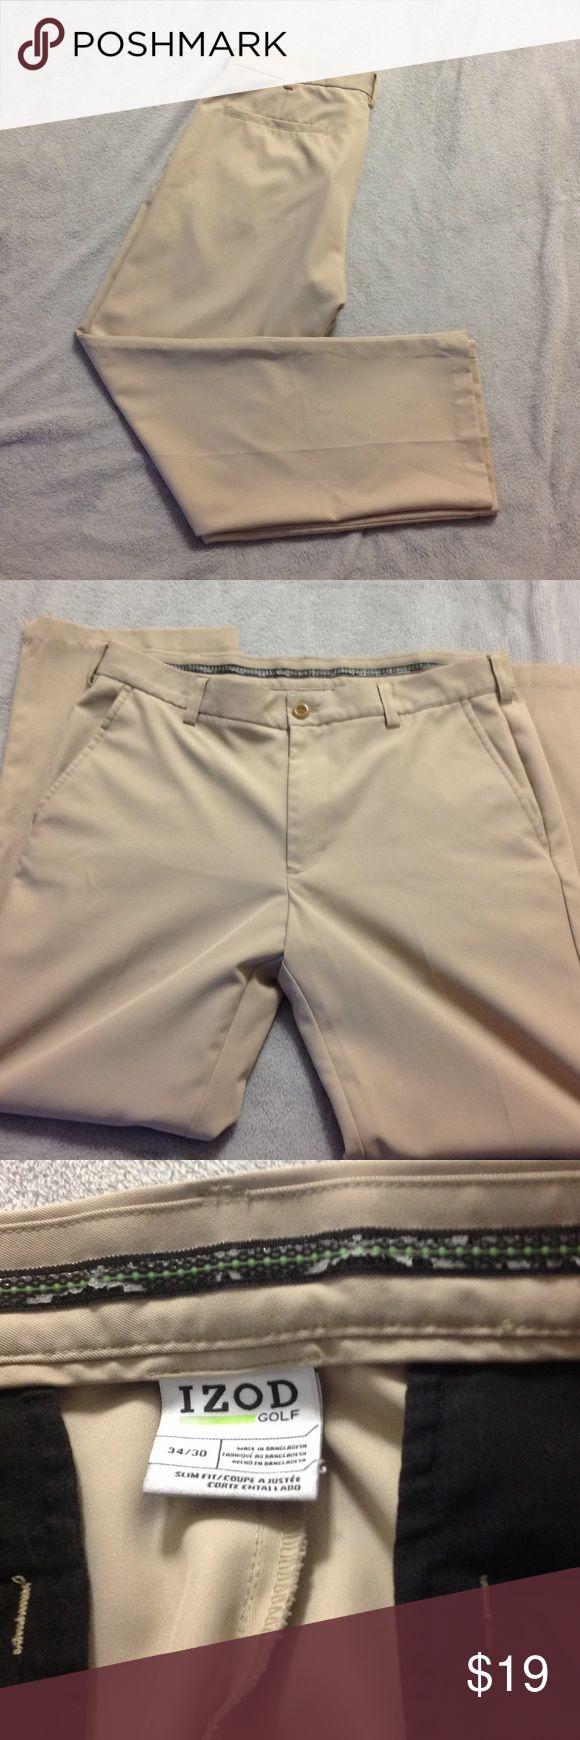 Izod golf pants Like new golf pants Izod Pants